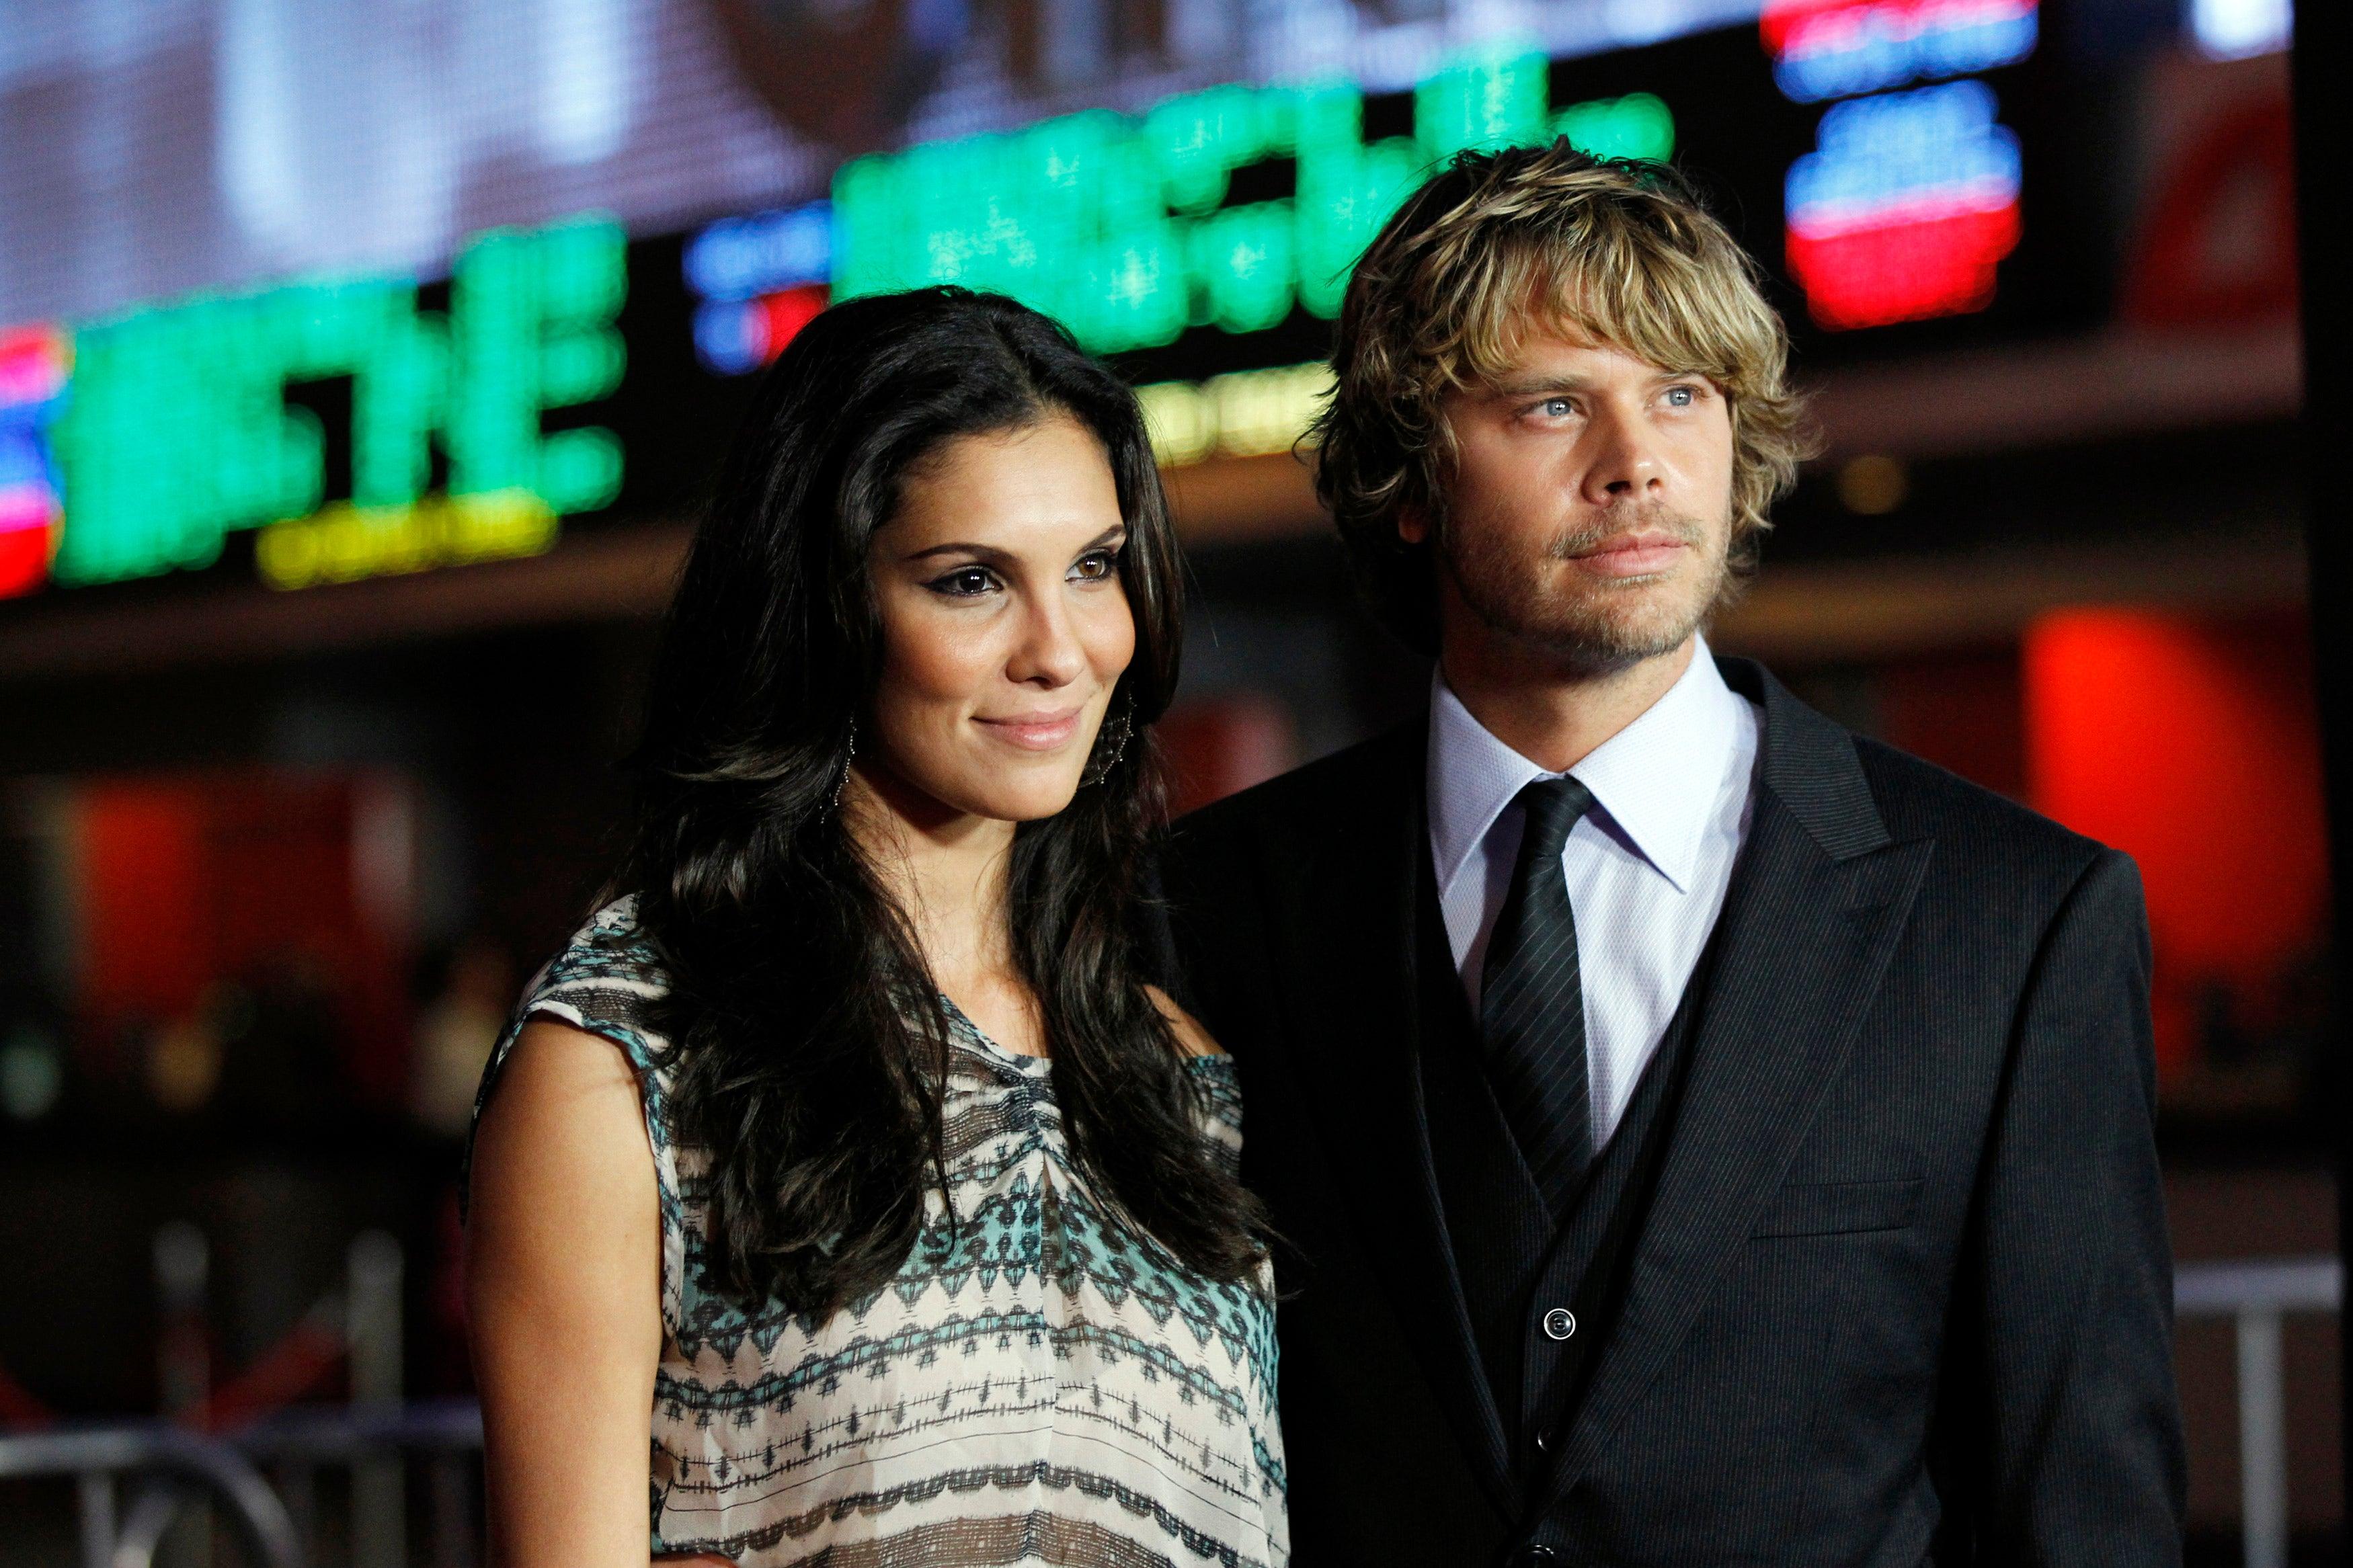 Ncis La: 'NCIS: LA' Stars Eric Christian Olsen And Daniela Ruah